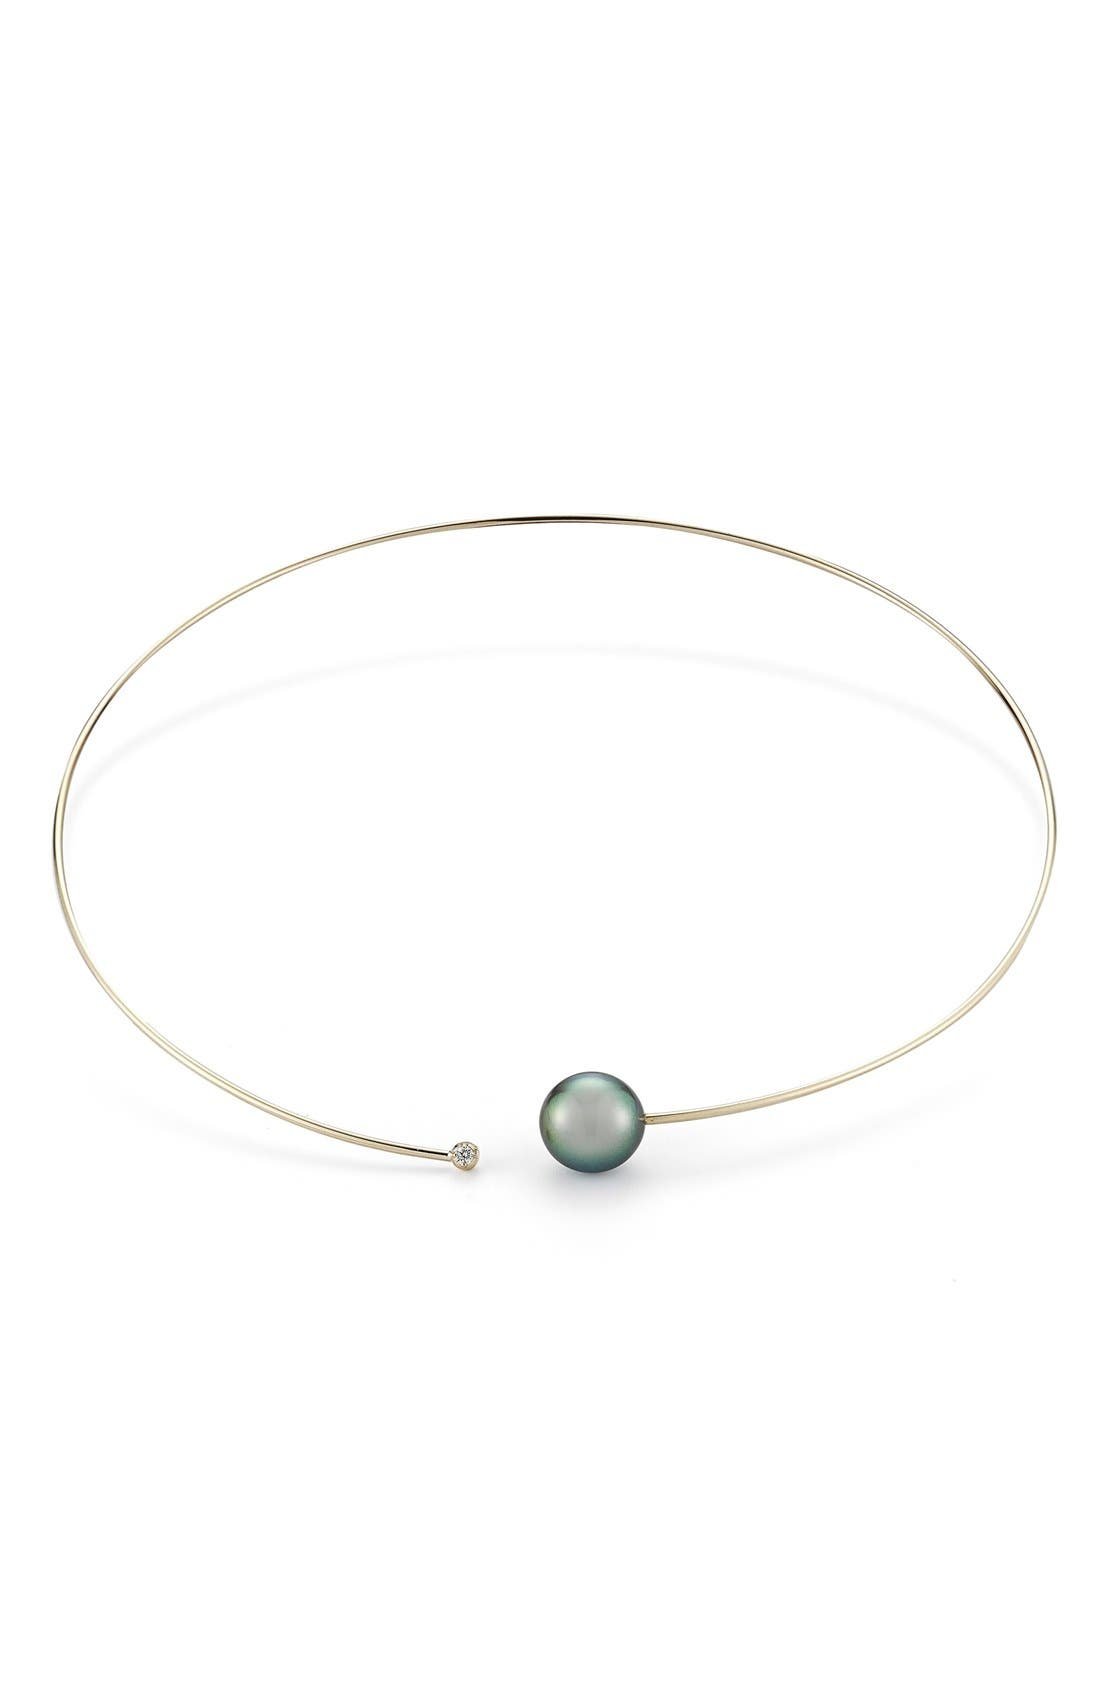 Diamond & Pearl Choker Necklace,                             Main thumbnail 1, color,                             YELLOW GOLD